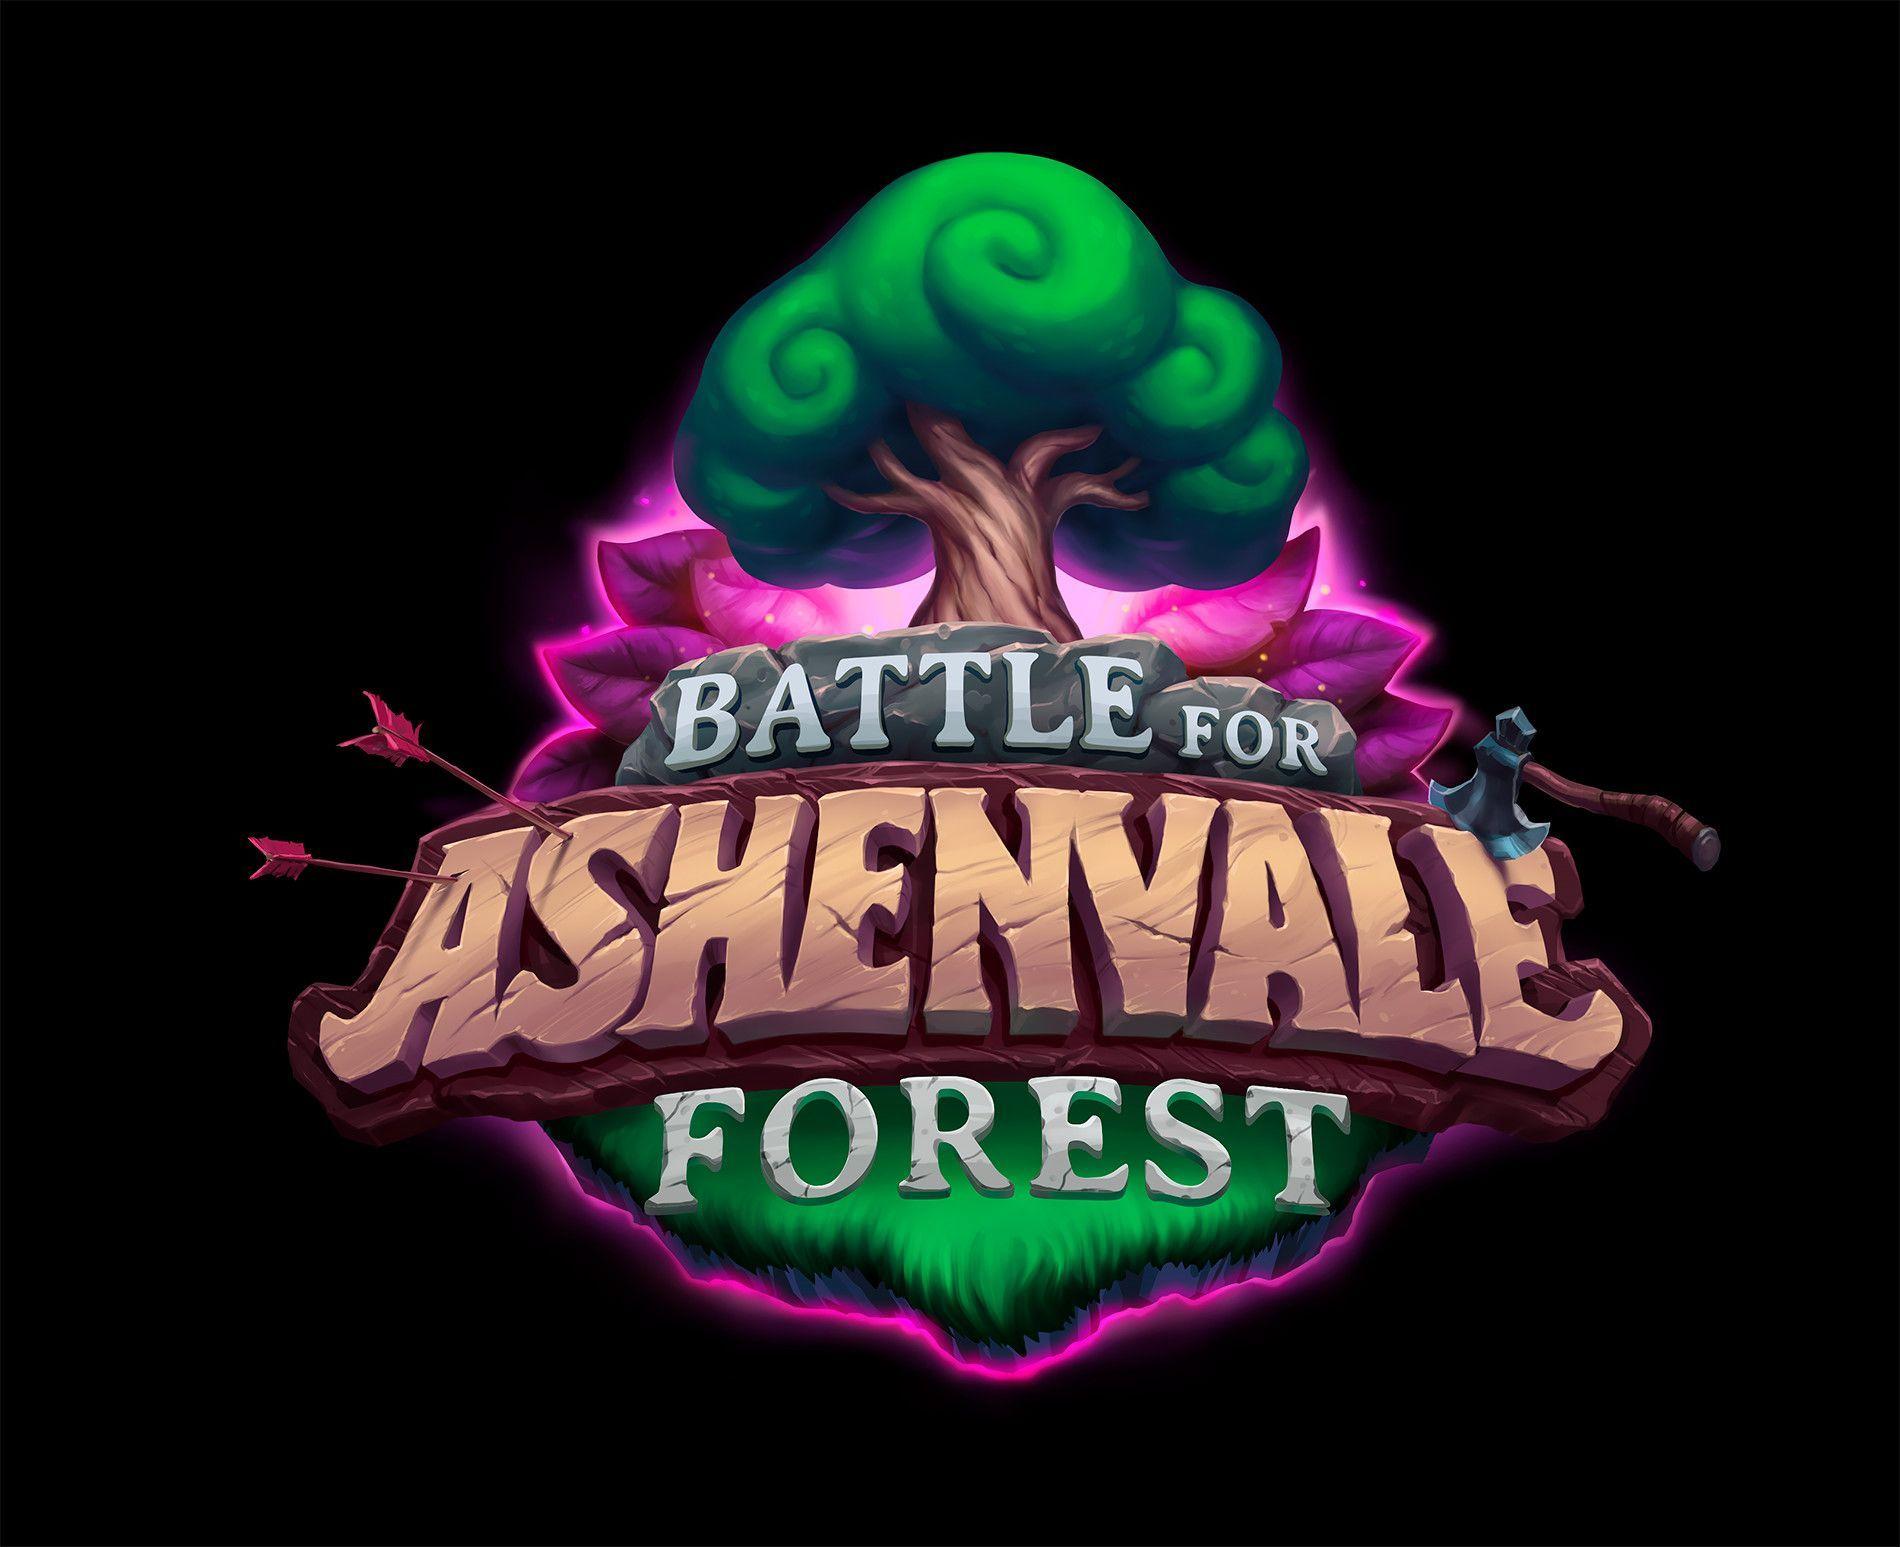 Hearthstone Battle For Ashenvale Forest Logo Arthur Tavares In 2020 Forest Logo Game Logo Design Fantasy Logo Echa un vistazo a nuestra selección de hearthstone logo para ver las mejores piezas hechas a mano, únicas o personalizadas de nuestras tiendas. ashenvale forest logo arthur tavares